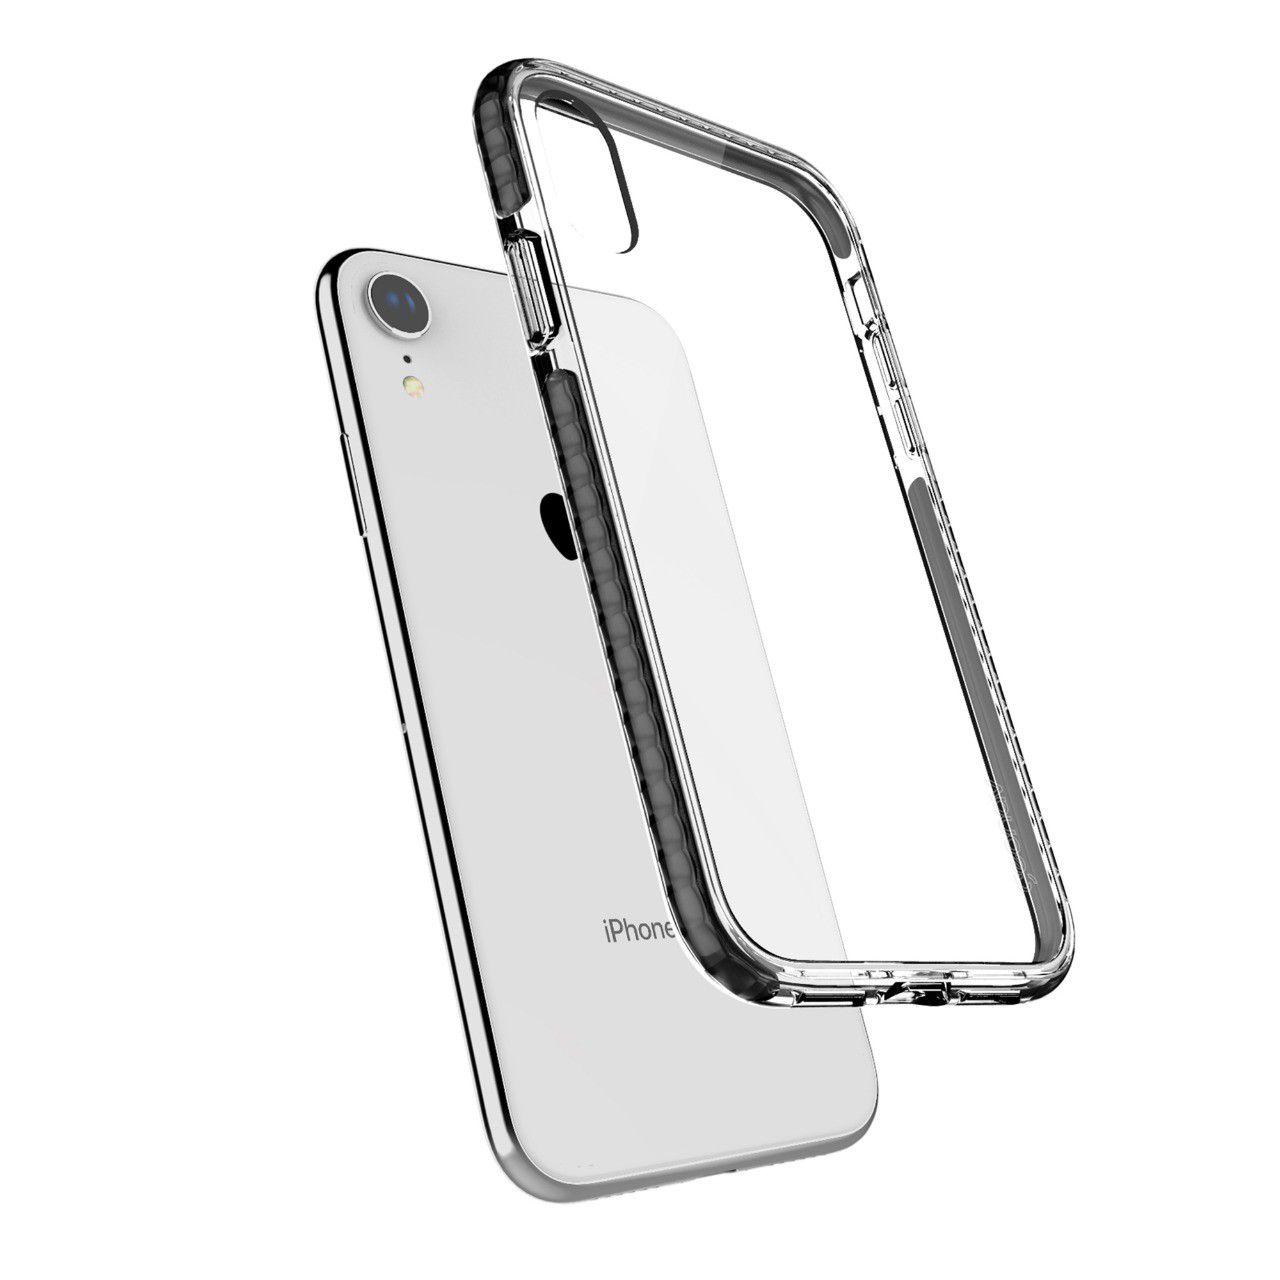 Capa Impact Pro X para Iphone XR Black - IPIXRB - Geonav